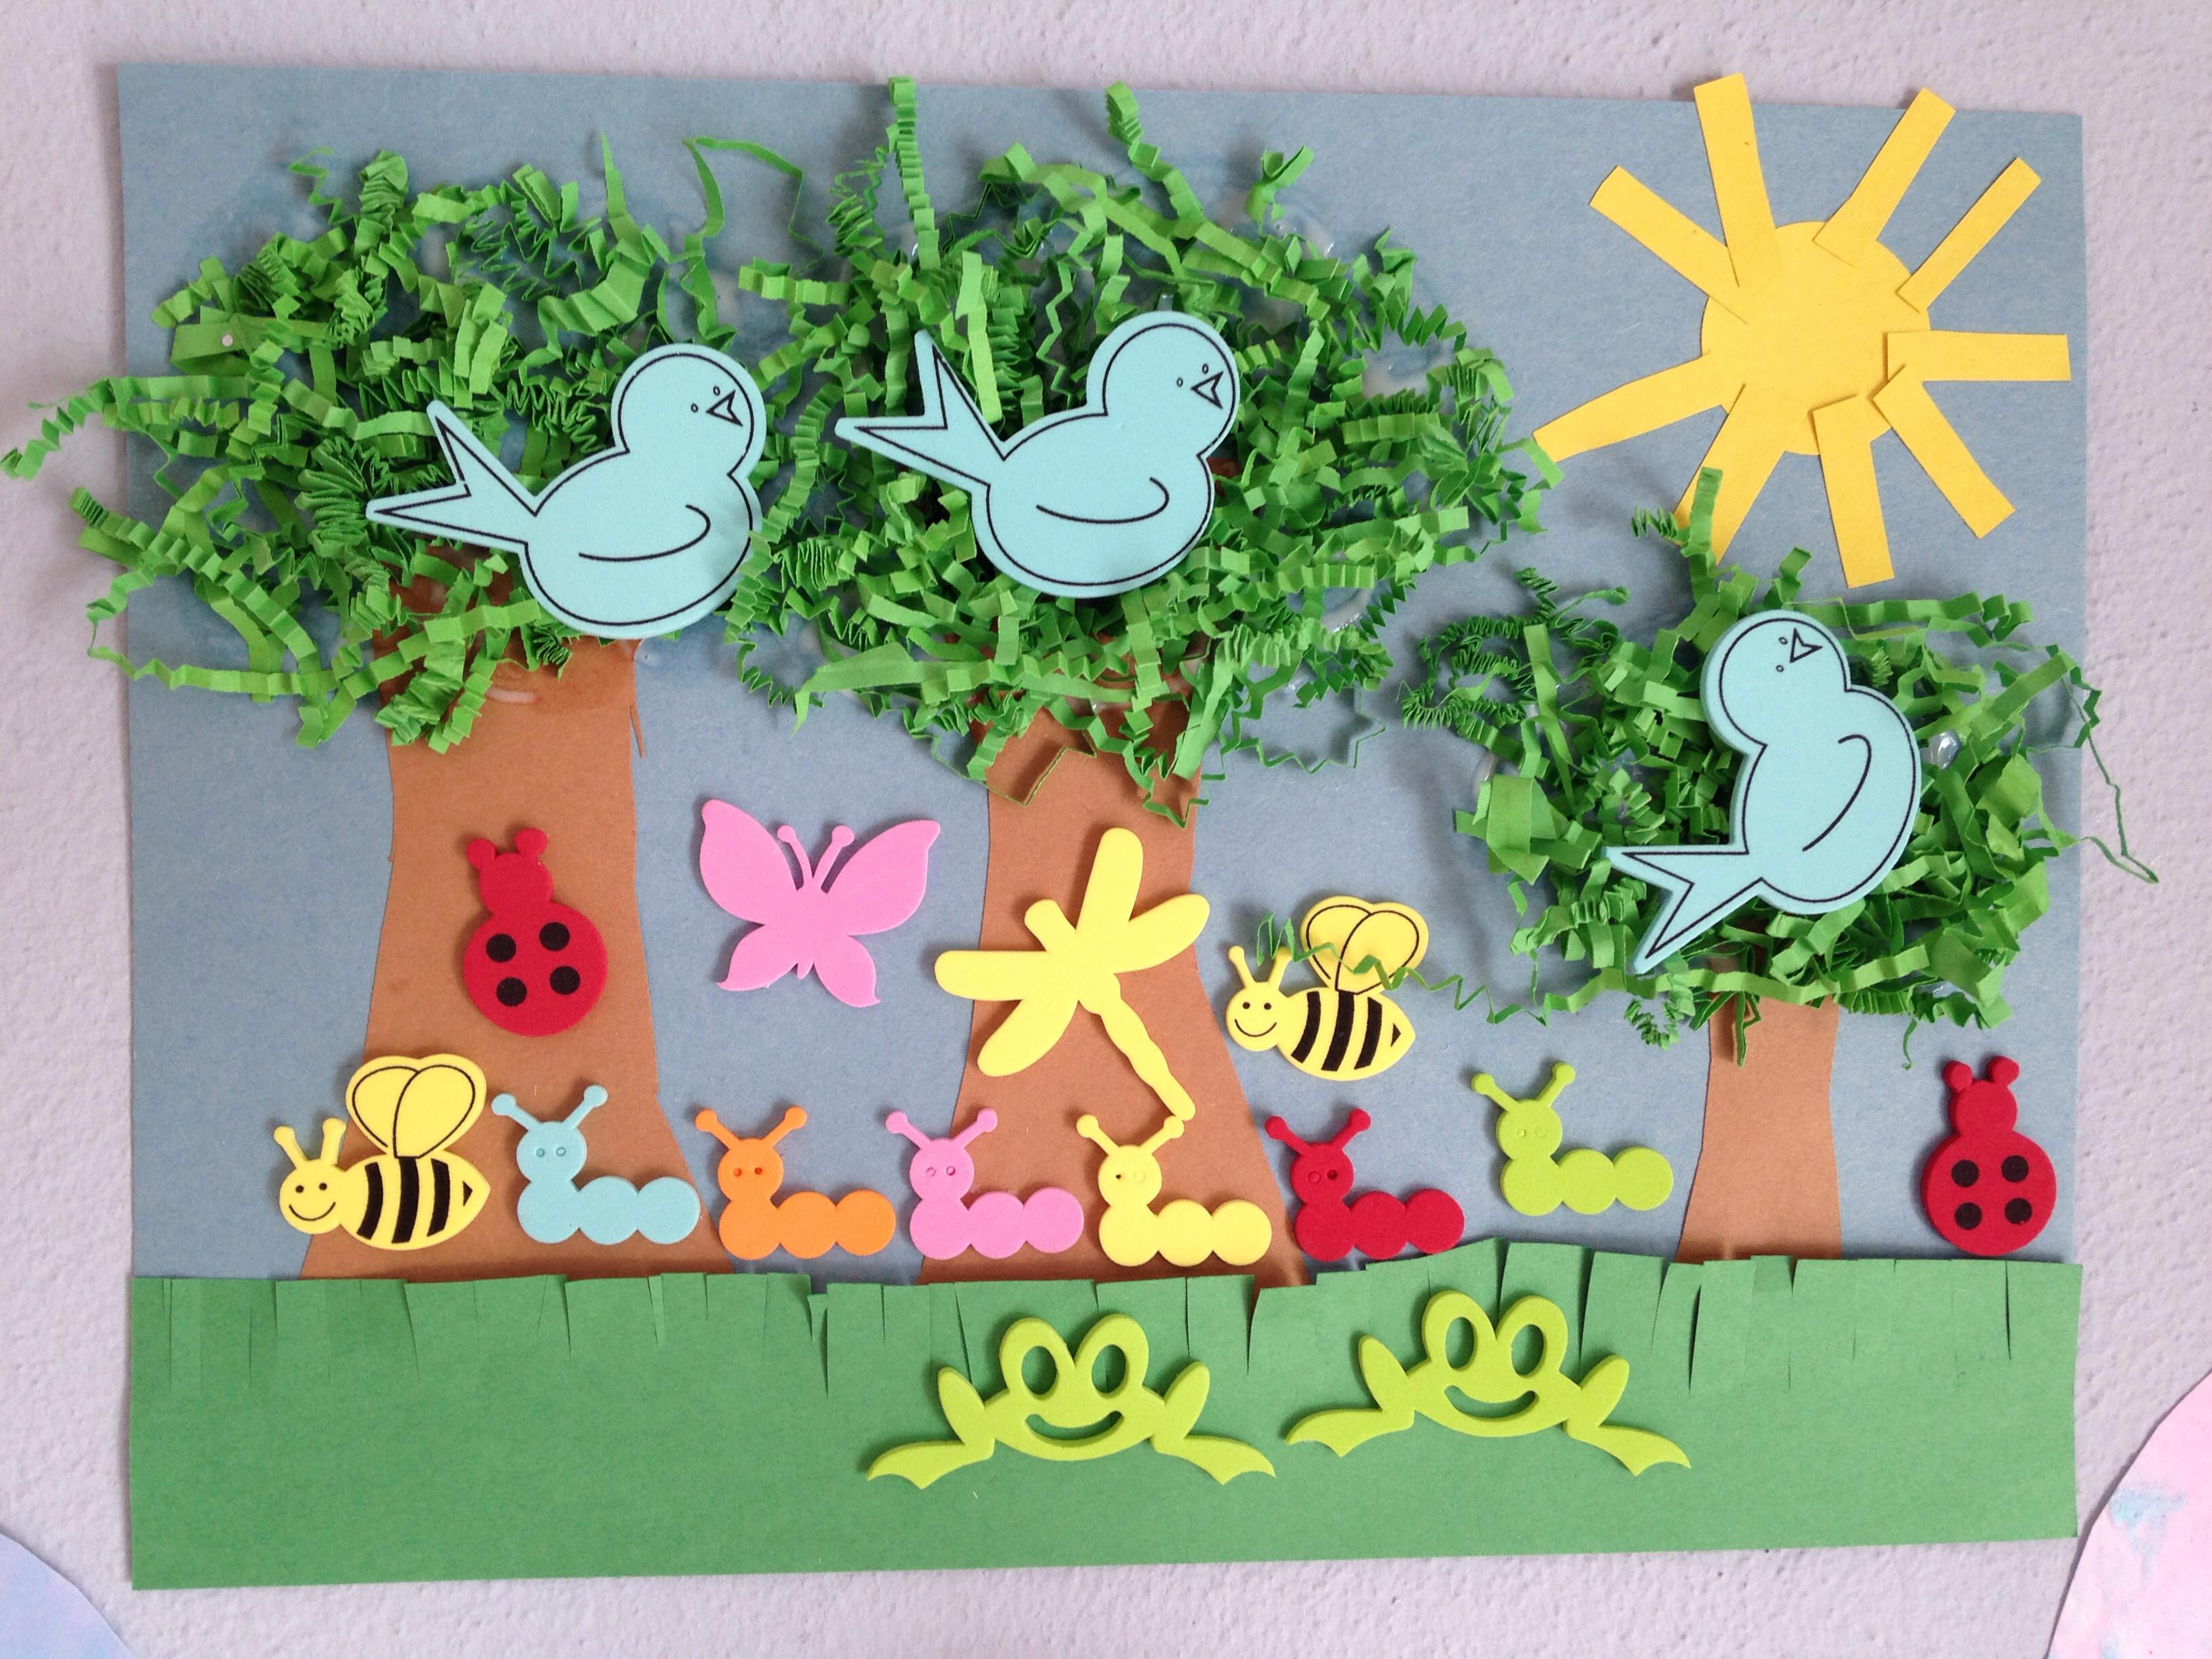 Spring Craft For Preschoolers  spring paper crafts Preschool and Homeschool